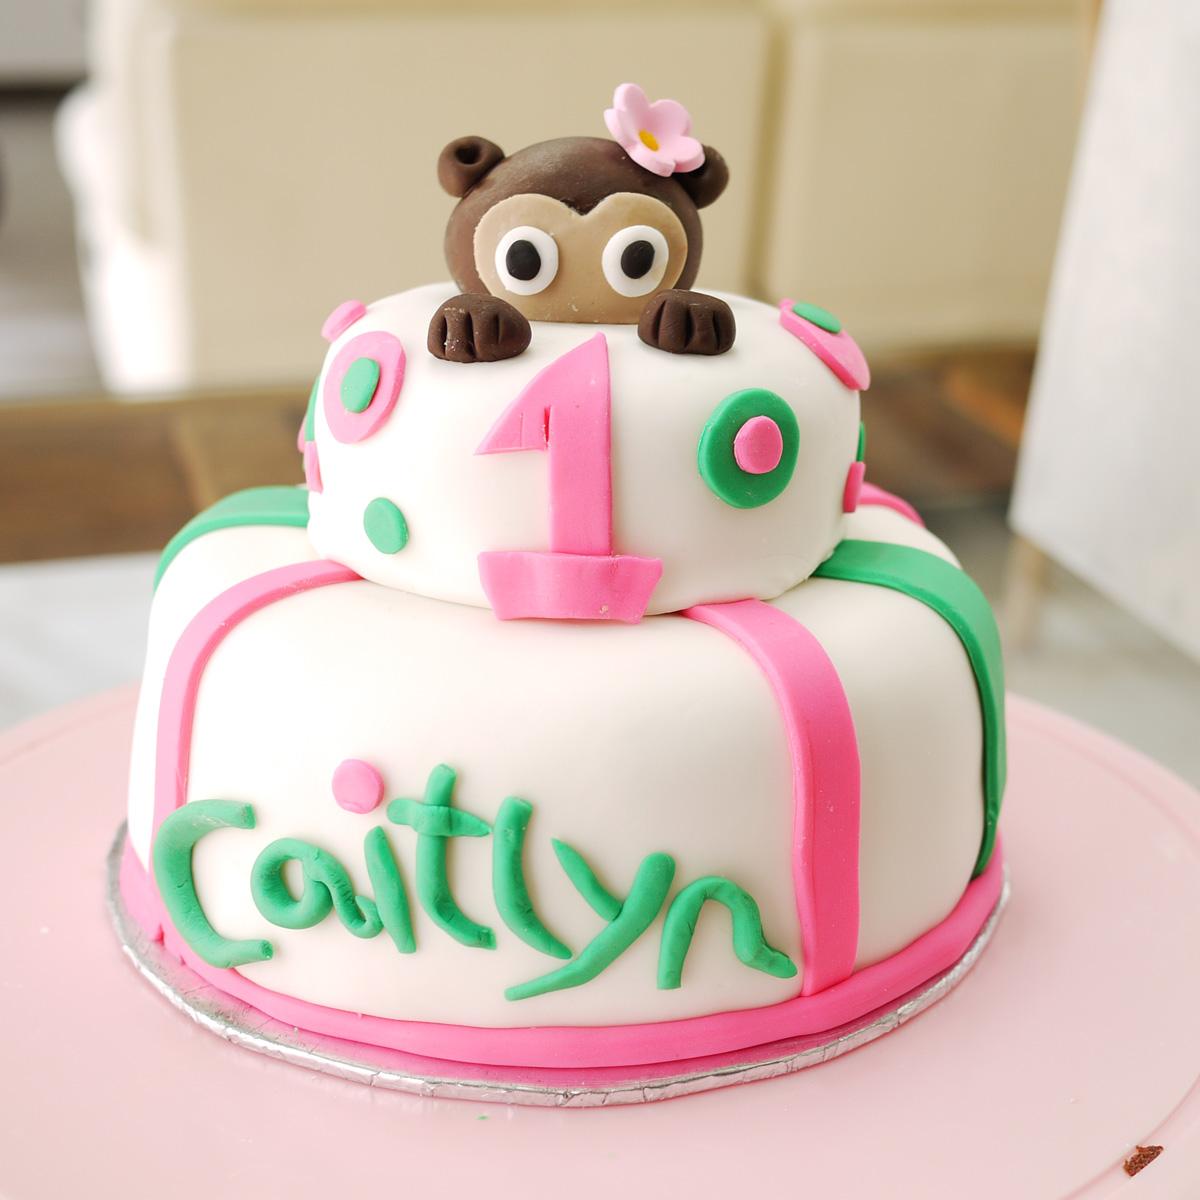 Happy Birthday Baby Caitlyn Crustabakes